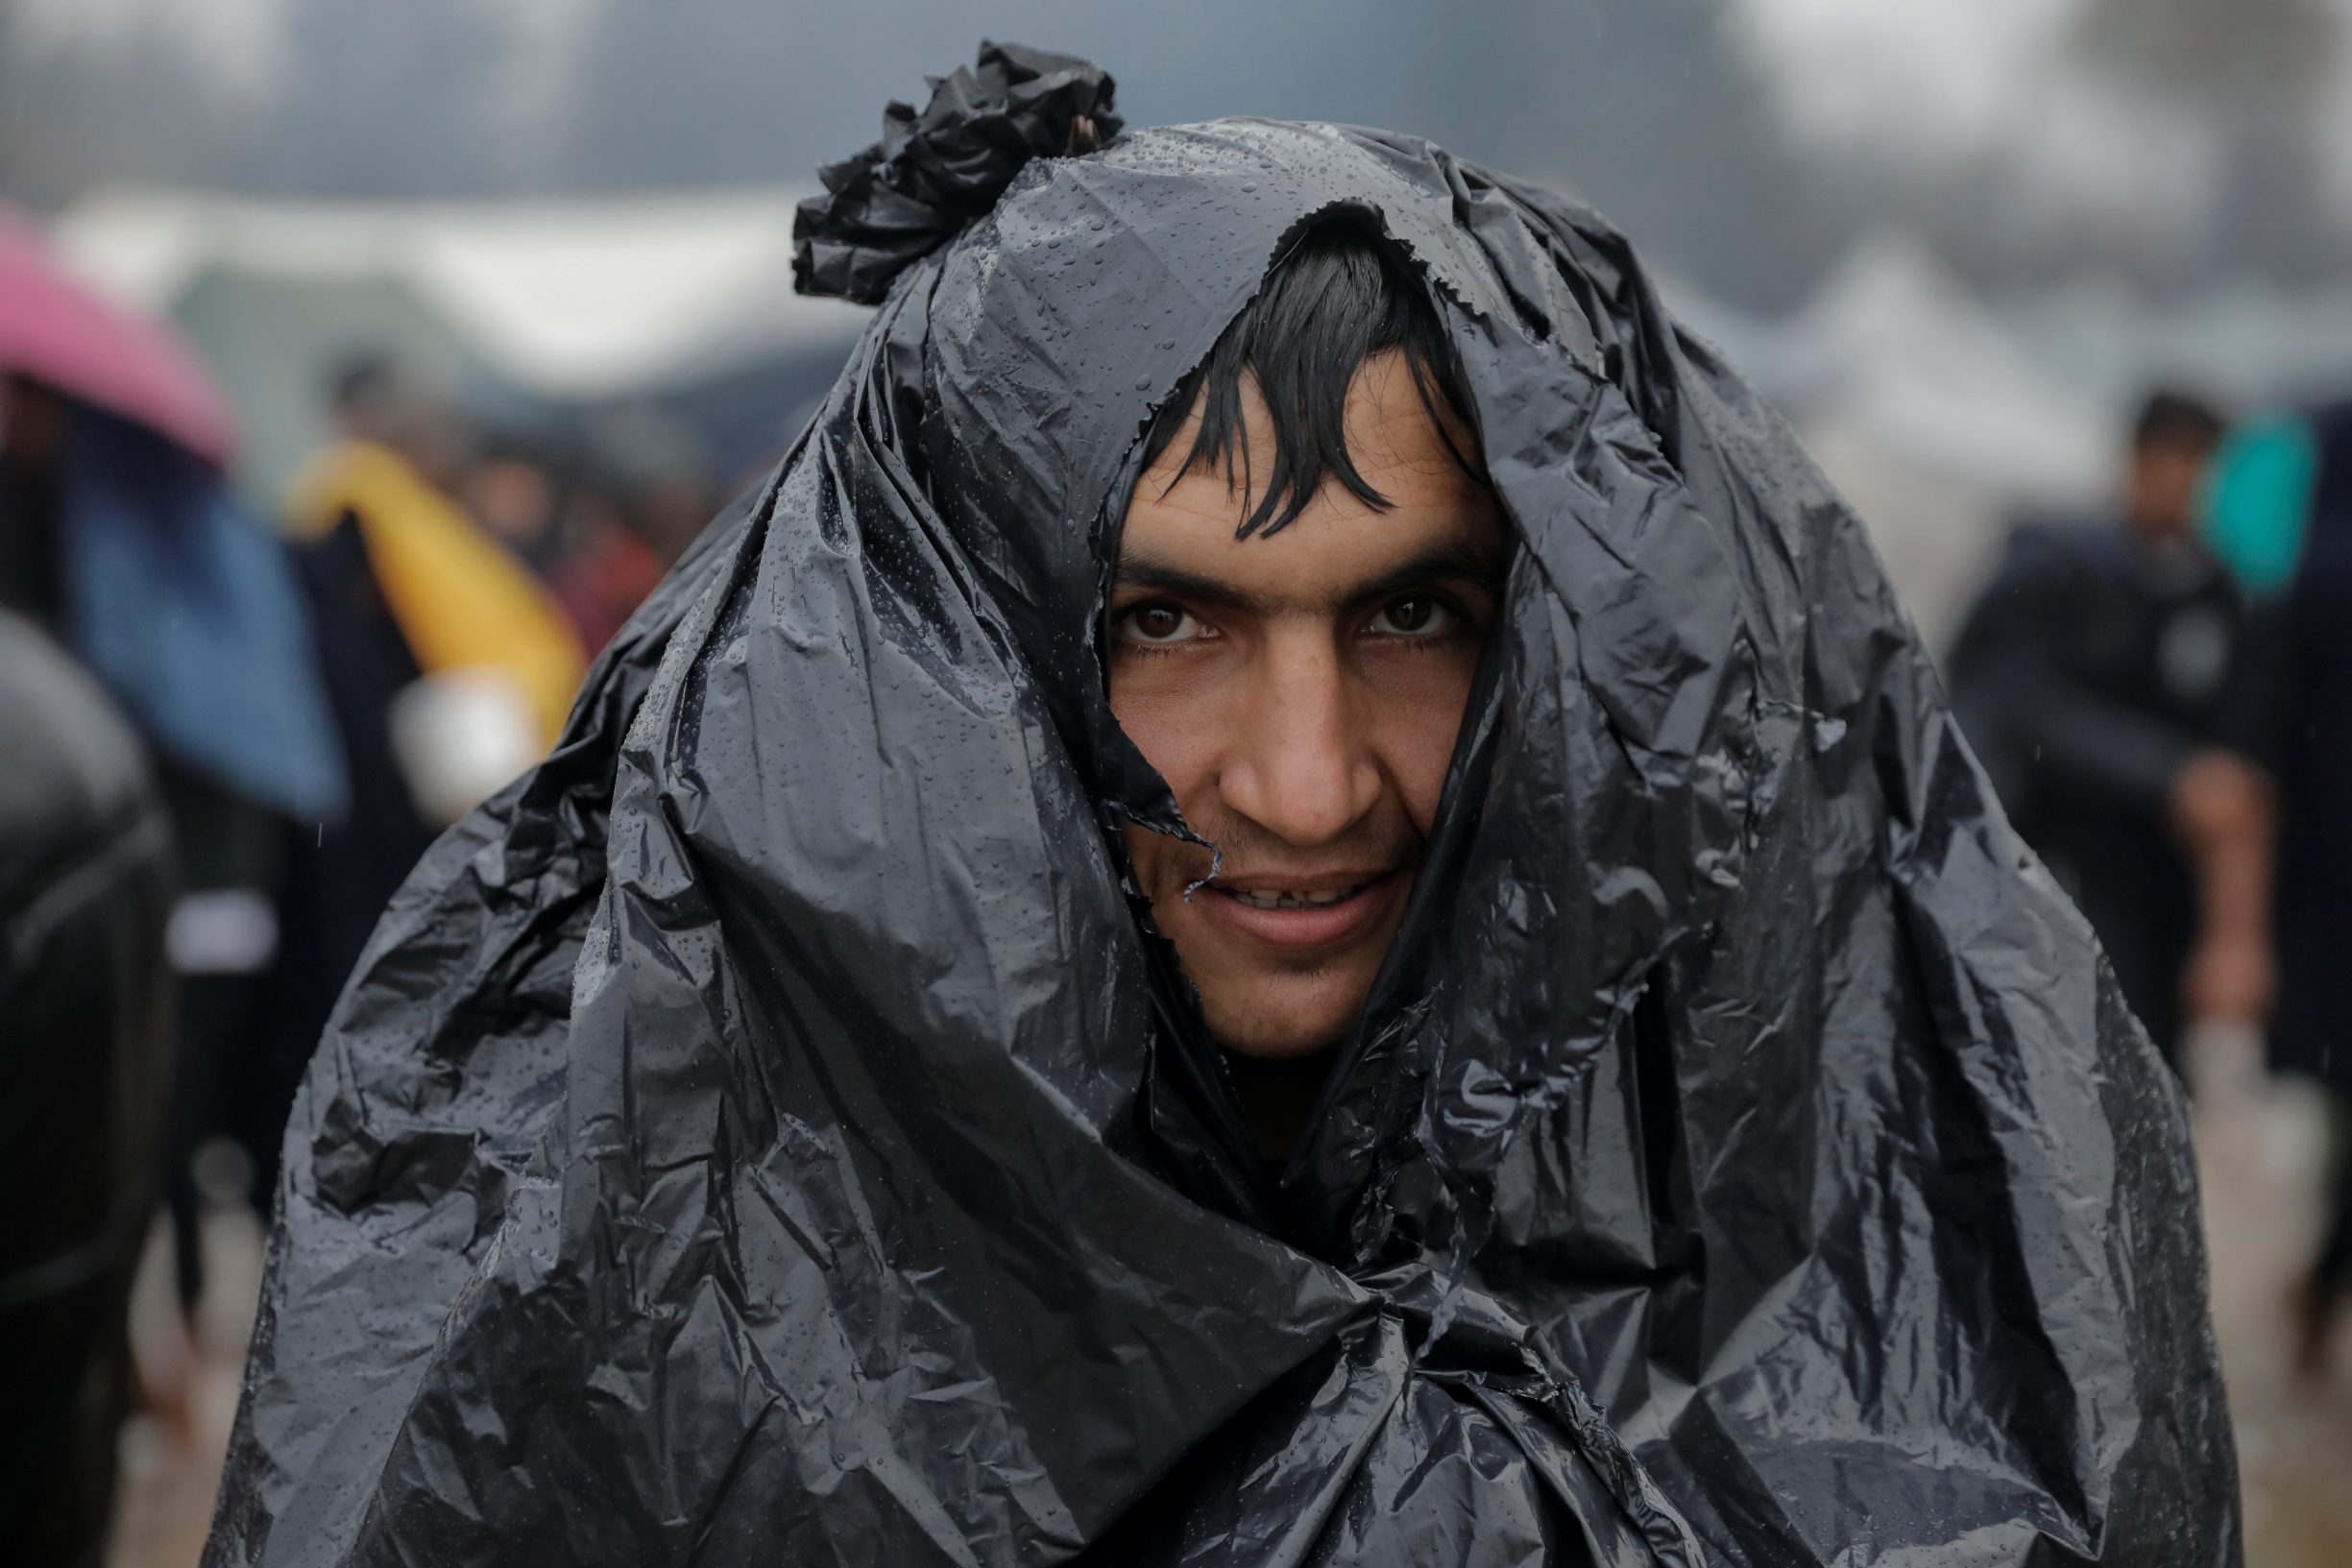 A migrant queues for free food inside Vucjak camp near Bihac, Bosnia and Herzegovina, November 13, 2019. Picture taken November 13, 2019. REUTERS/Marko Djurica